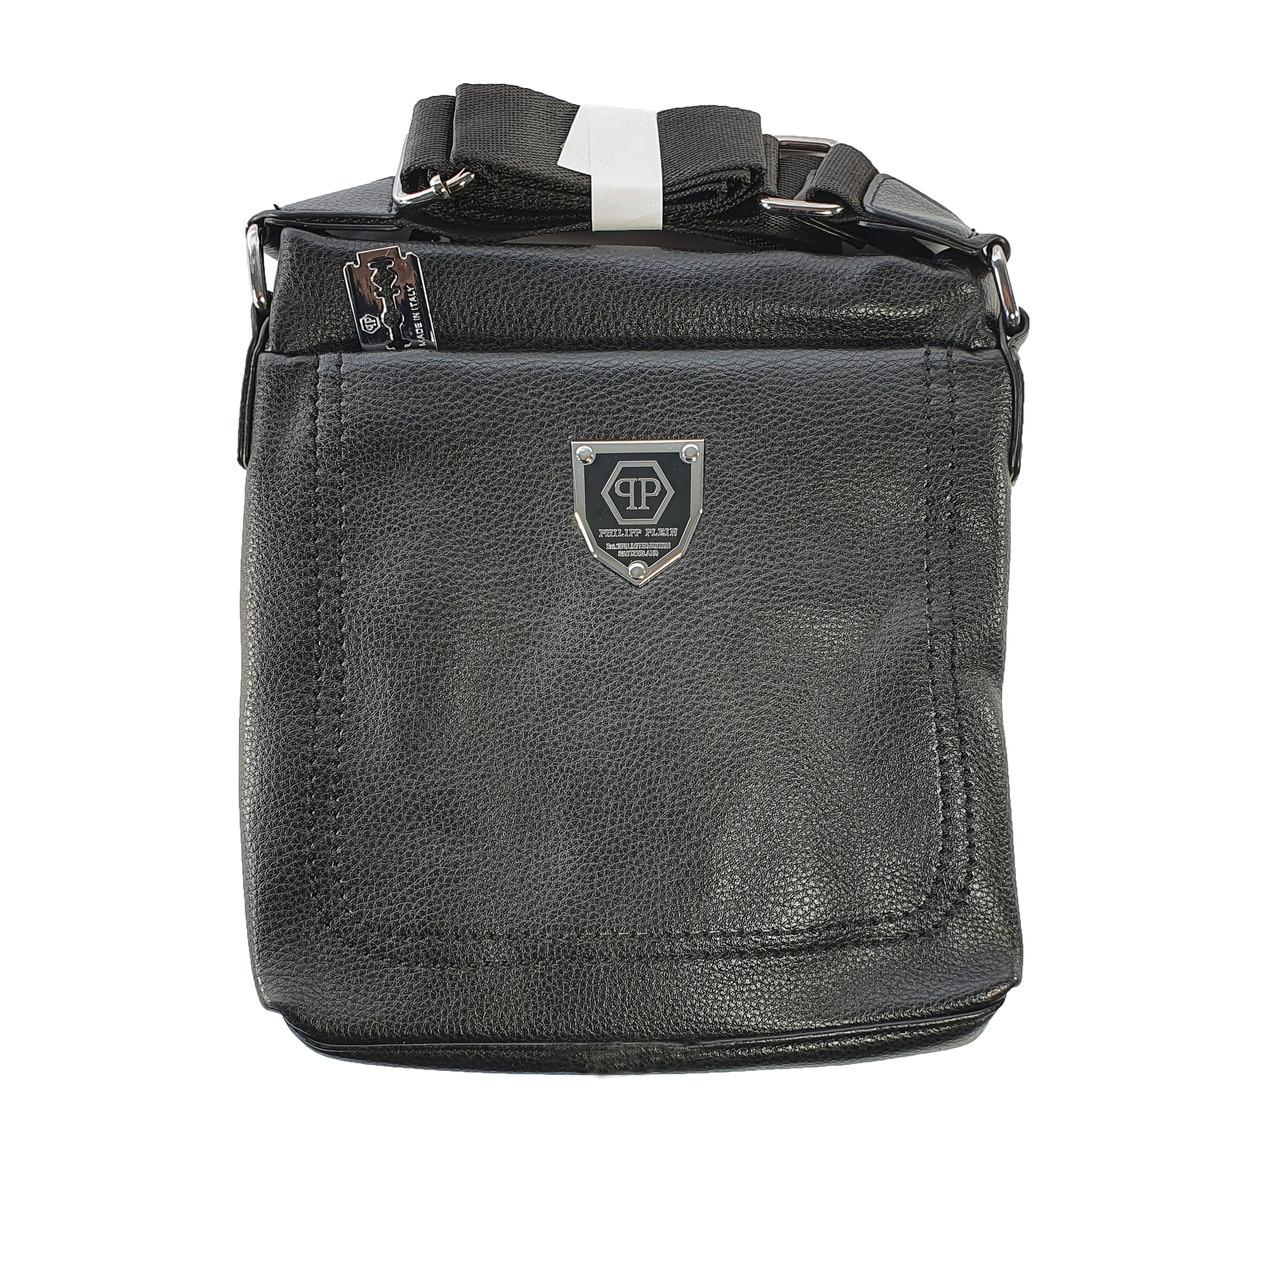 Односекционная сумка Philipp Plein, средняя